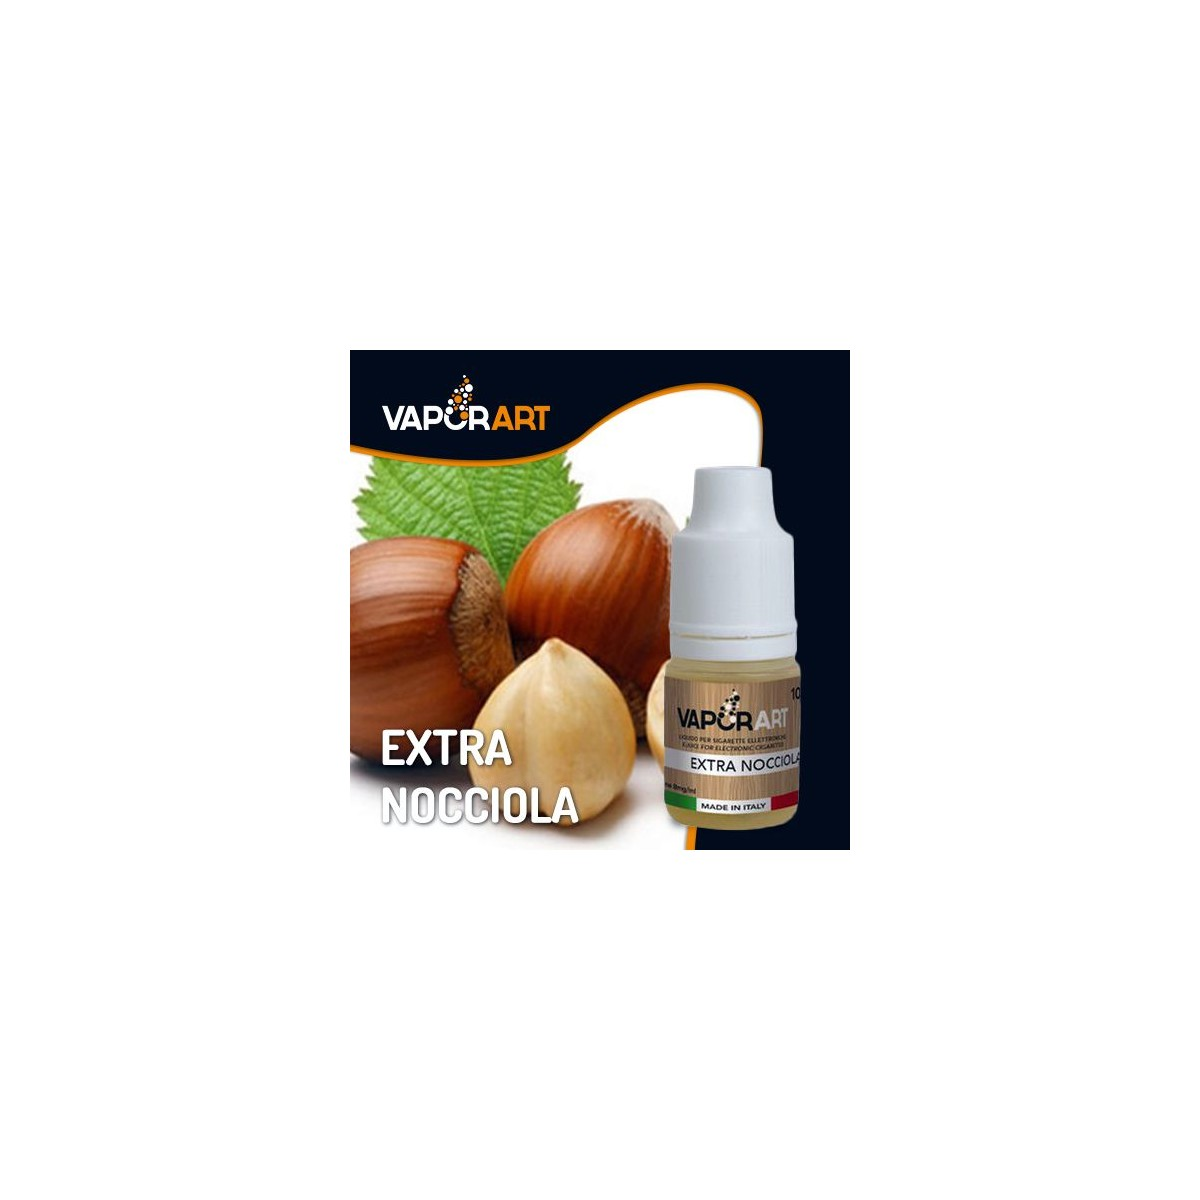 Vaporart 10ml - Extra Nocciola-0mg/ml